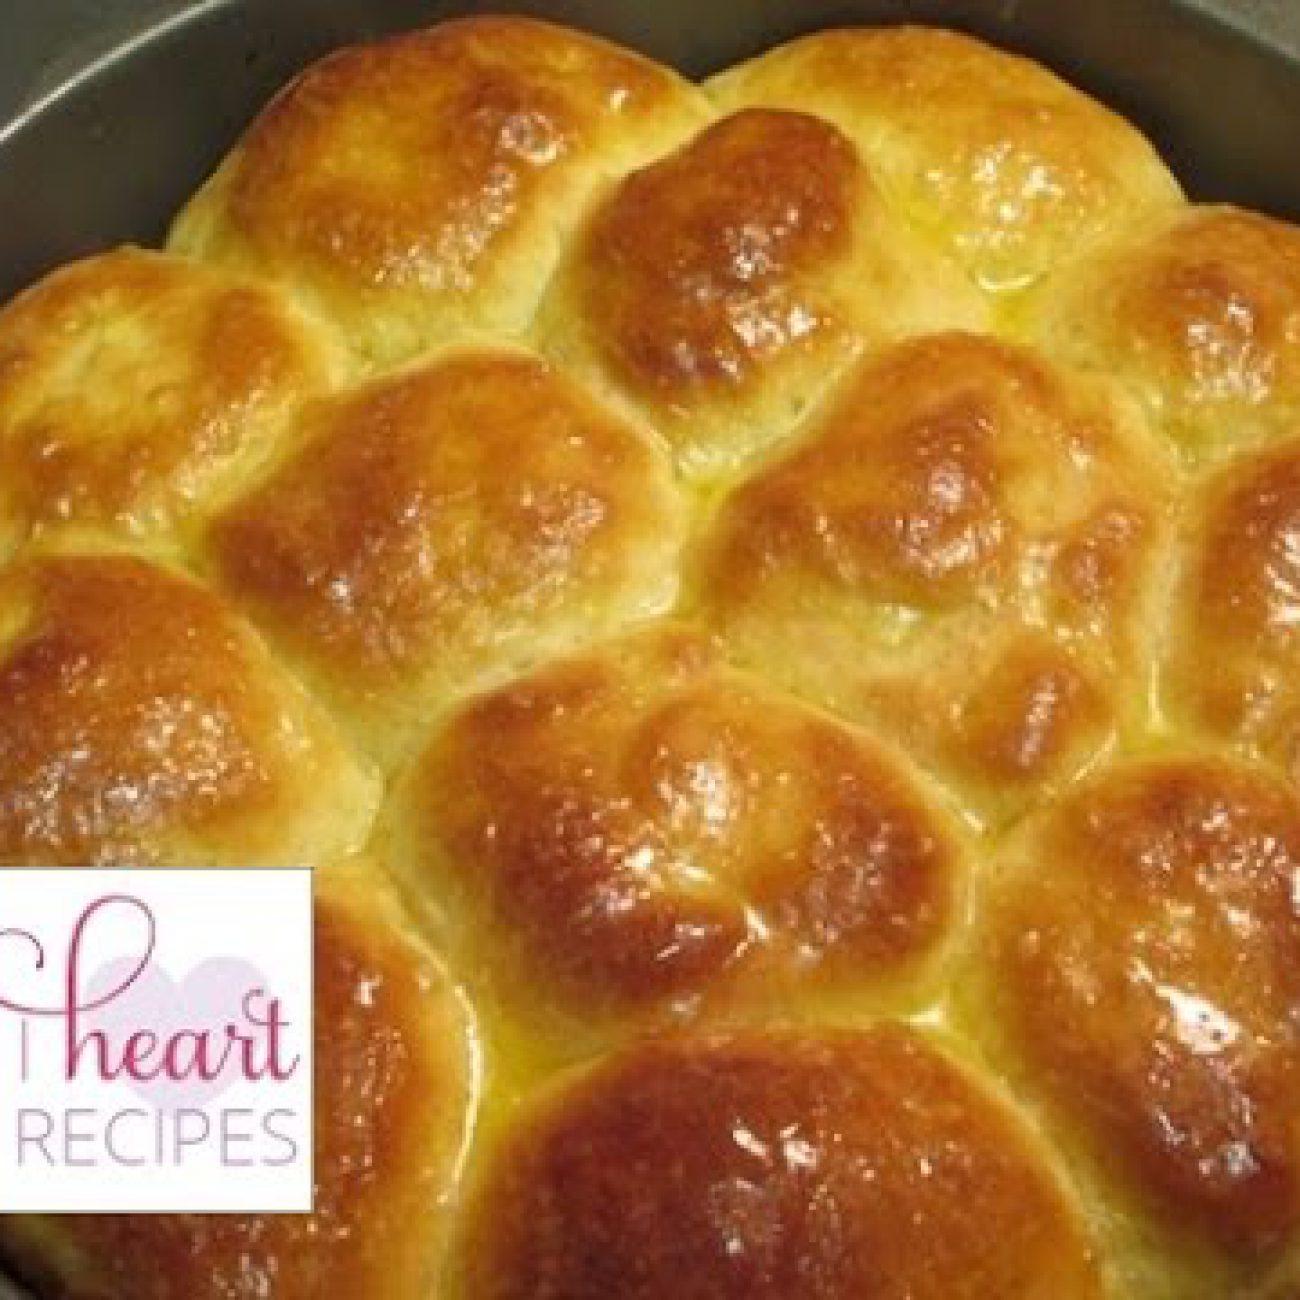 Homemade Yeast Dinner Rolls Recipe – How to Bake Homemade Rolls